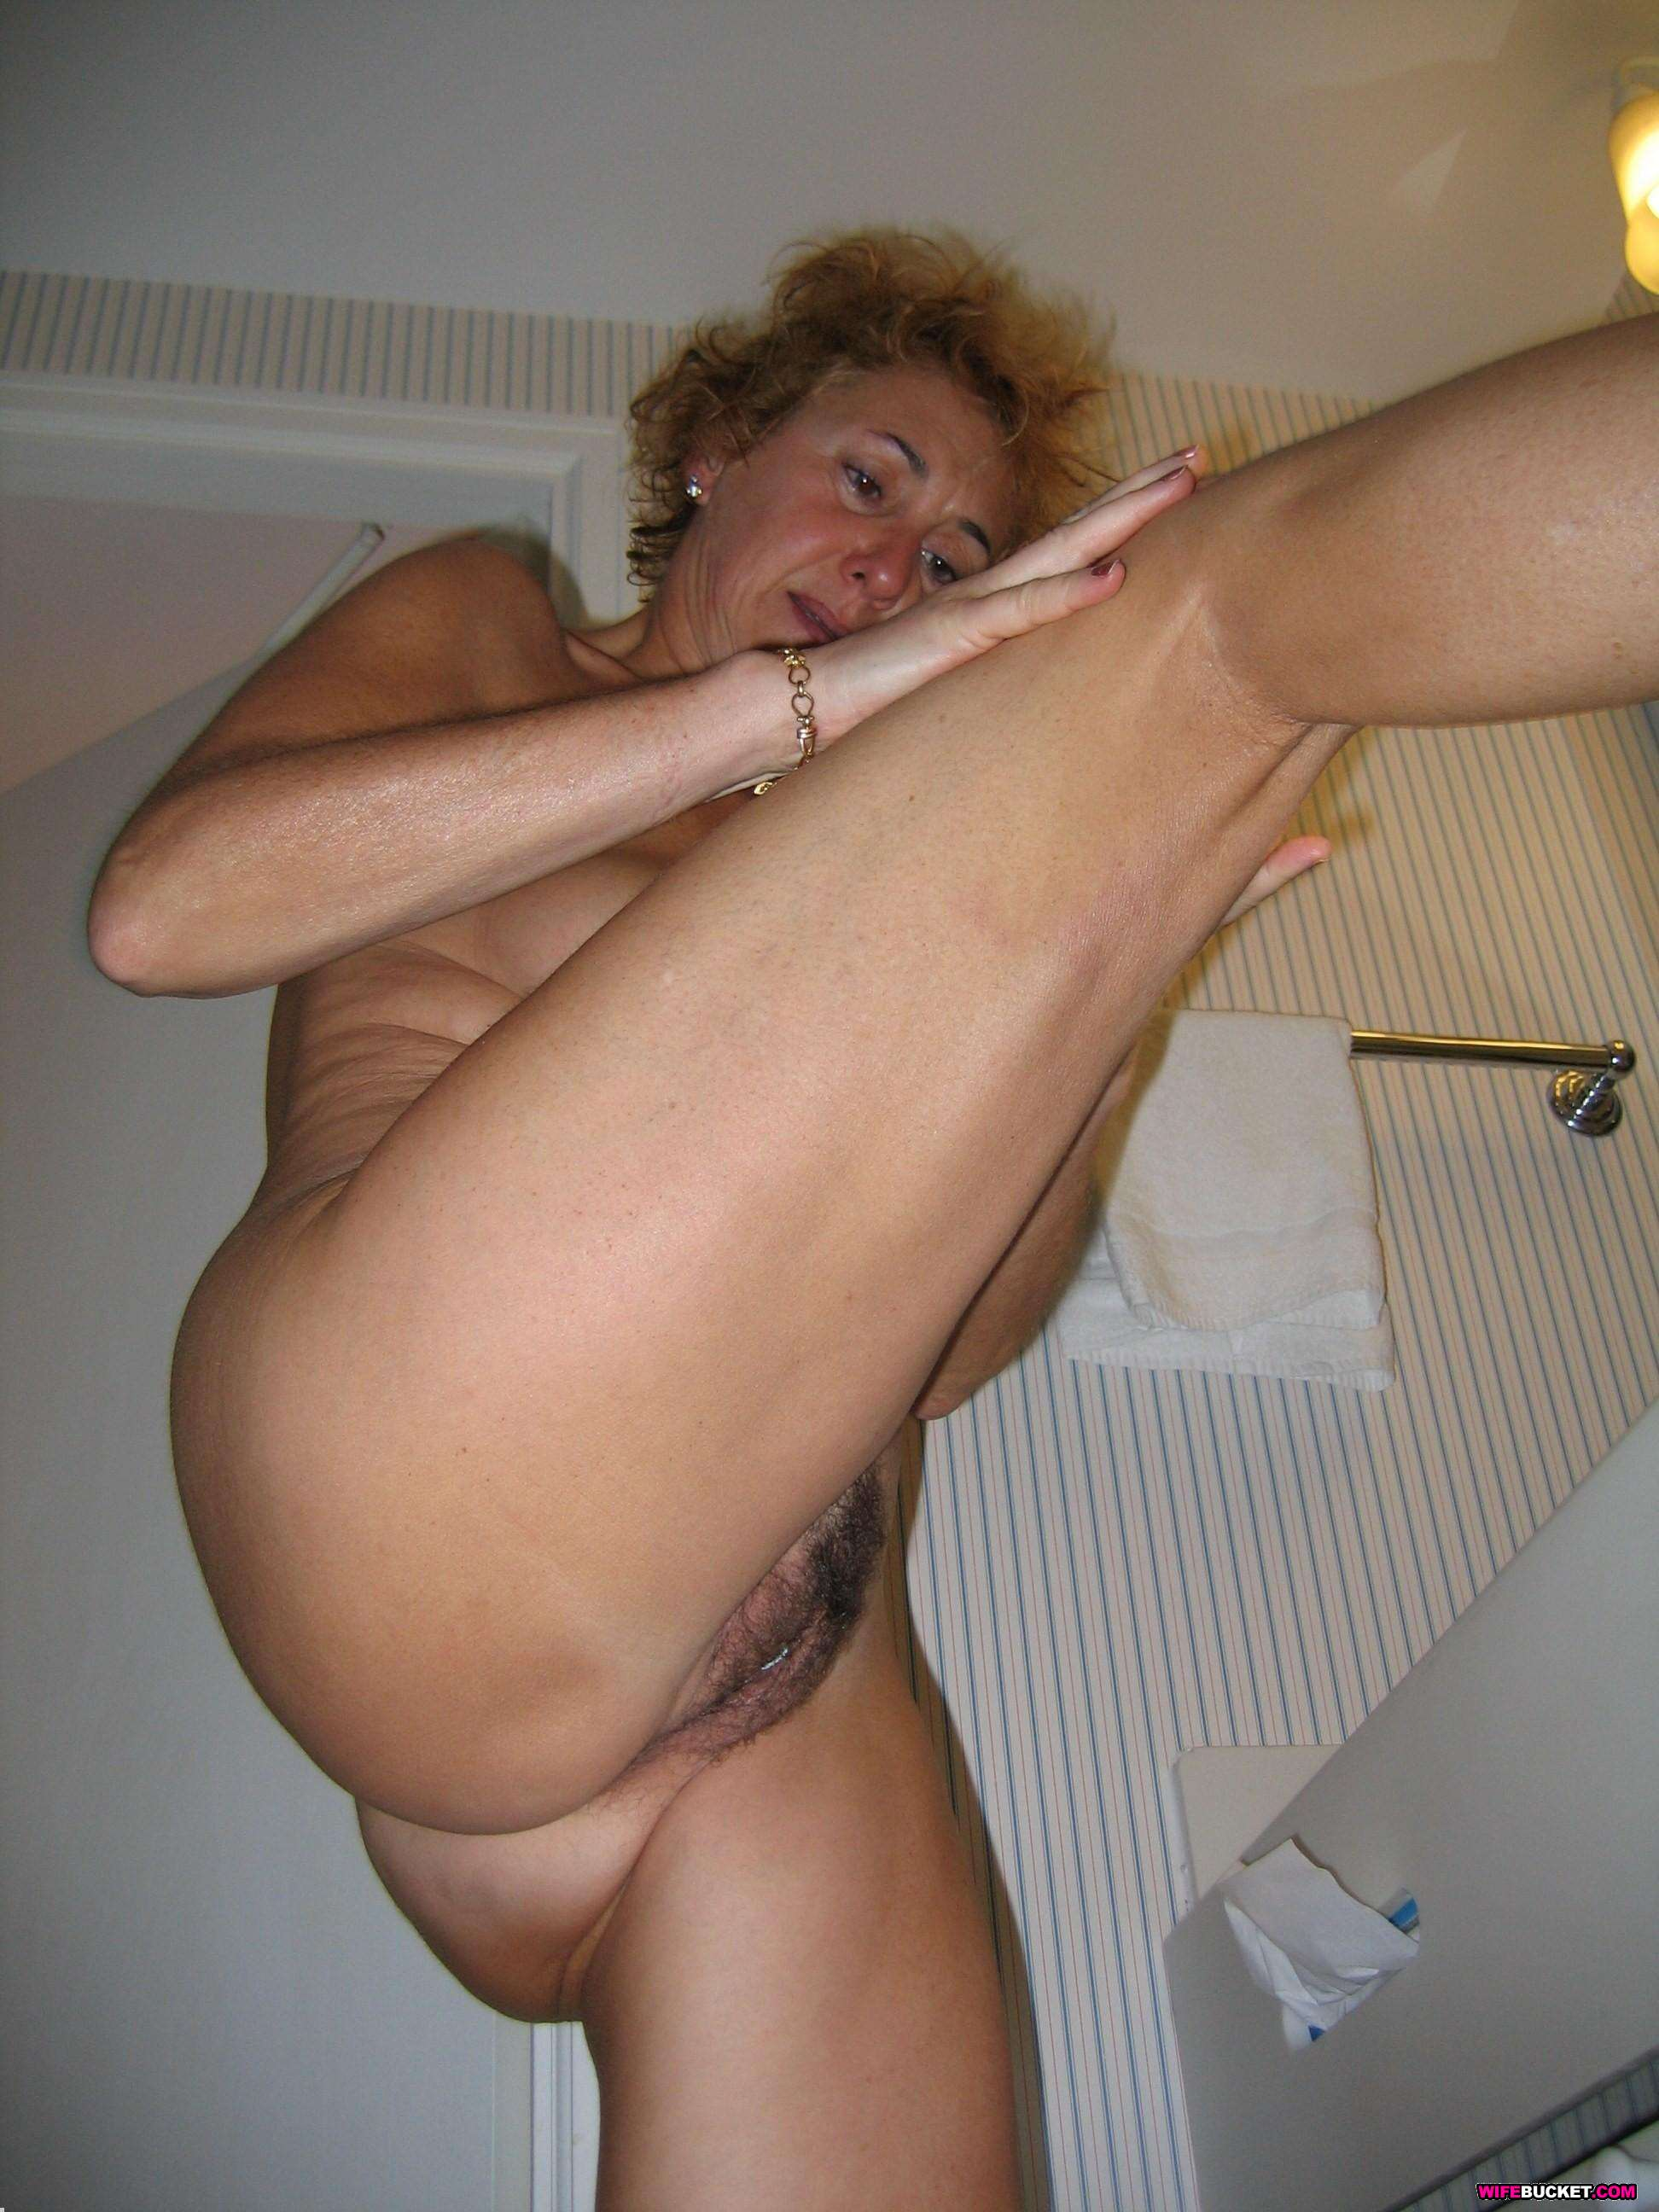 Фото галереи порно бабушки 17 фотография